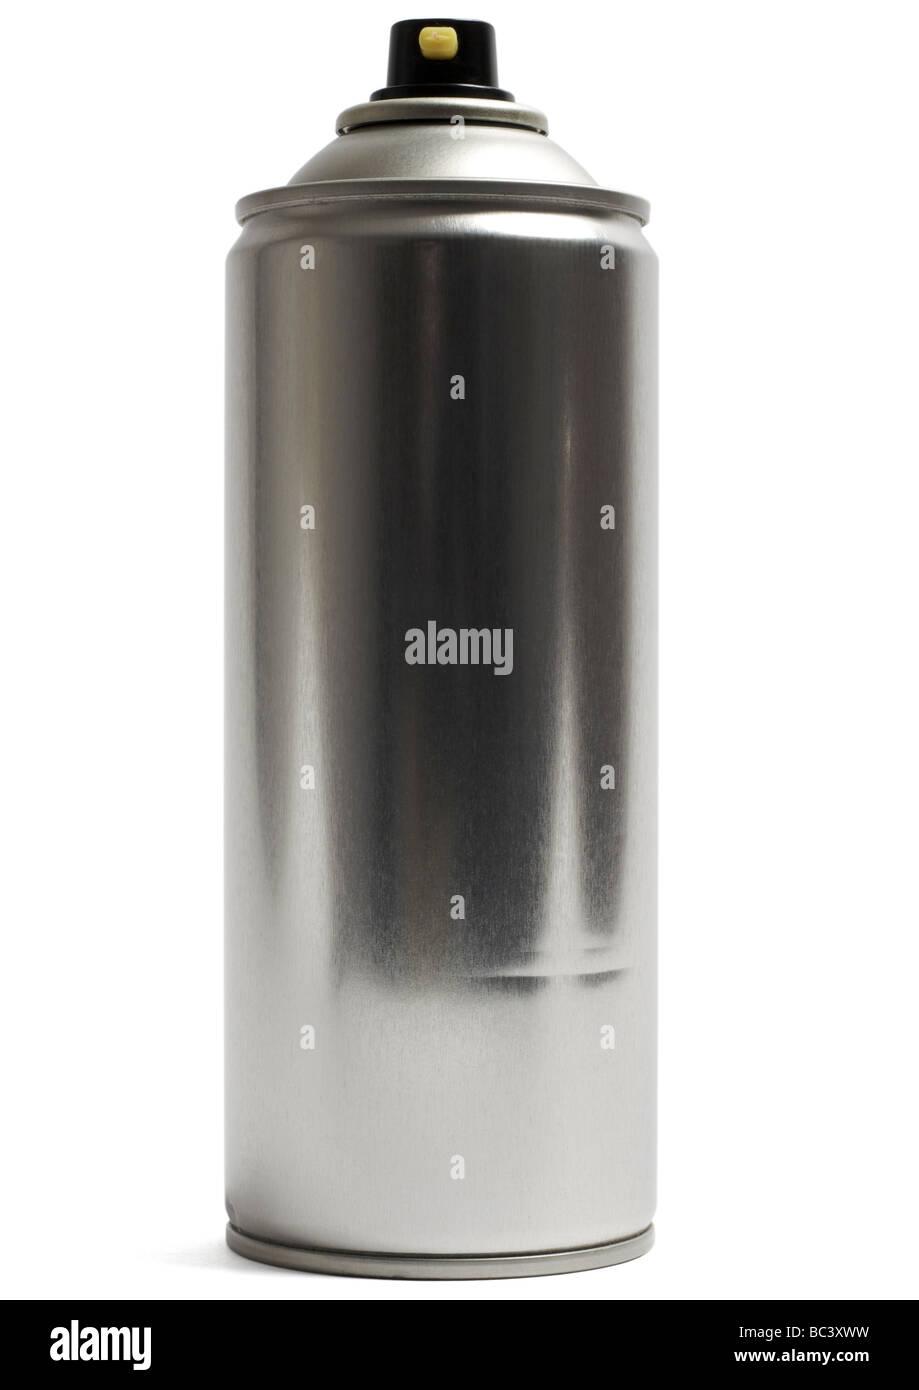 Aerosol spray can on white background - Stock Image